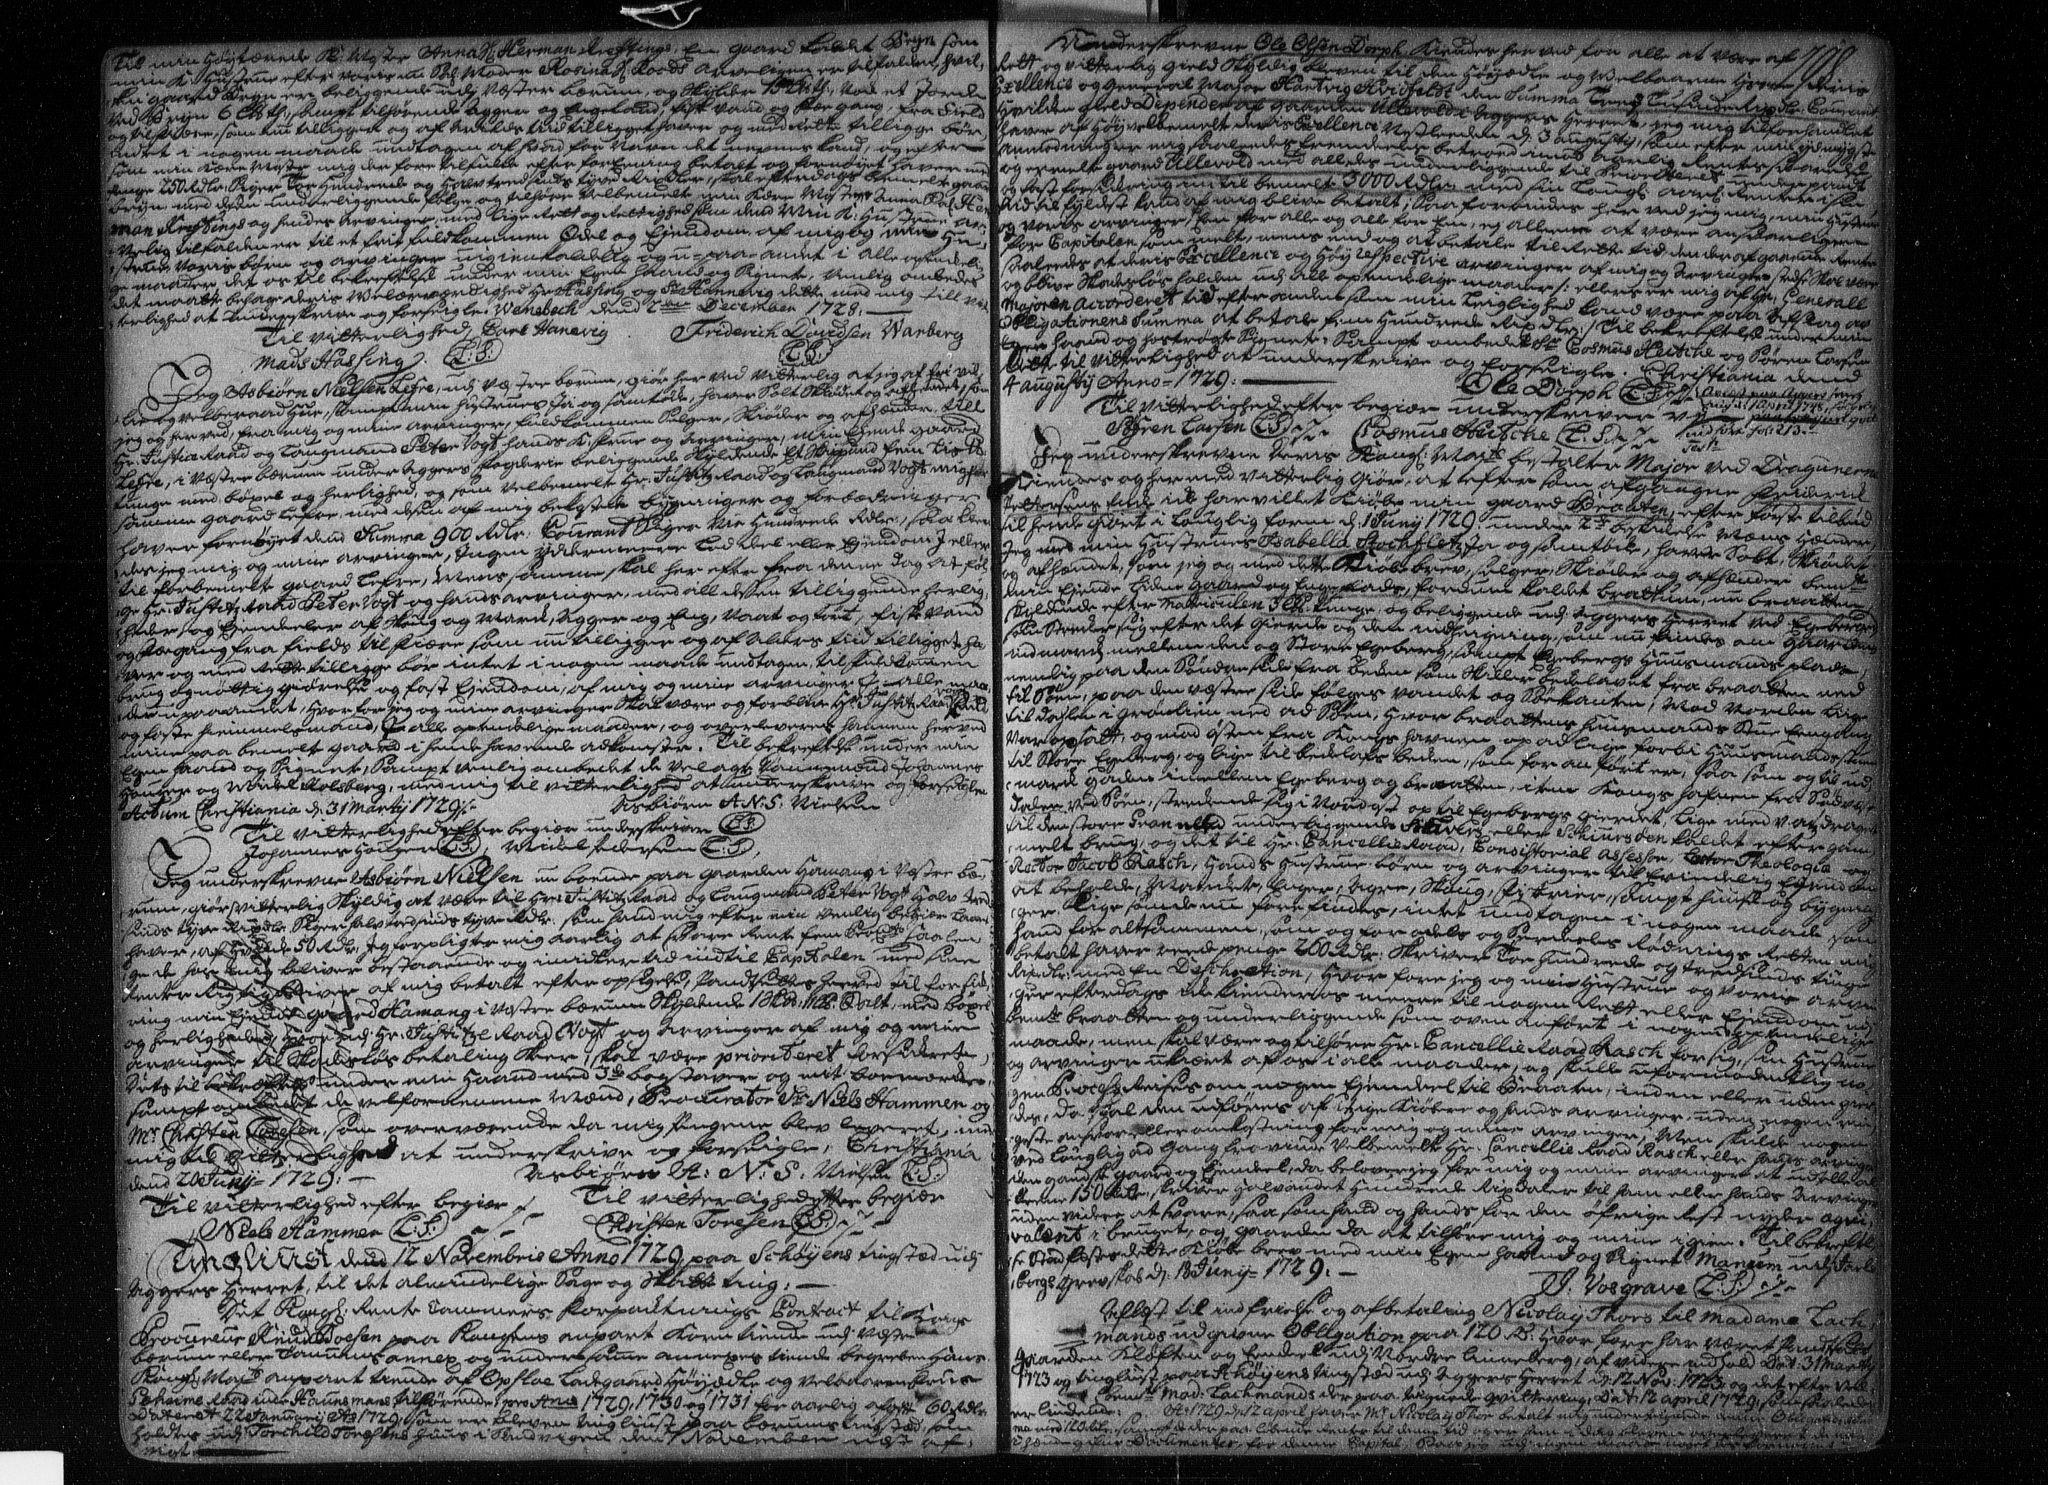 SAO, Aker sorenskriveri, G/Gb/Gba/L0001: Pantebok nr. I 1, 1710-1740, s. 198